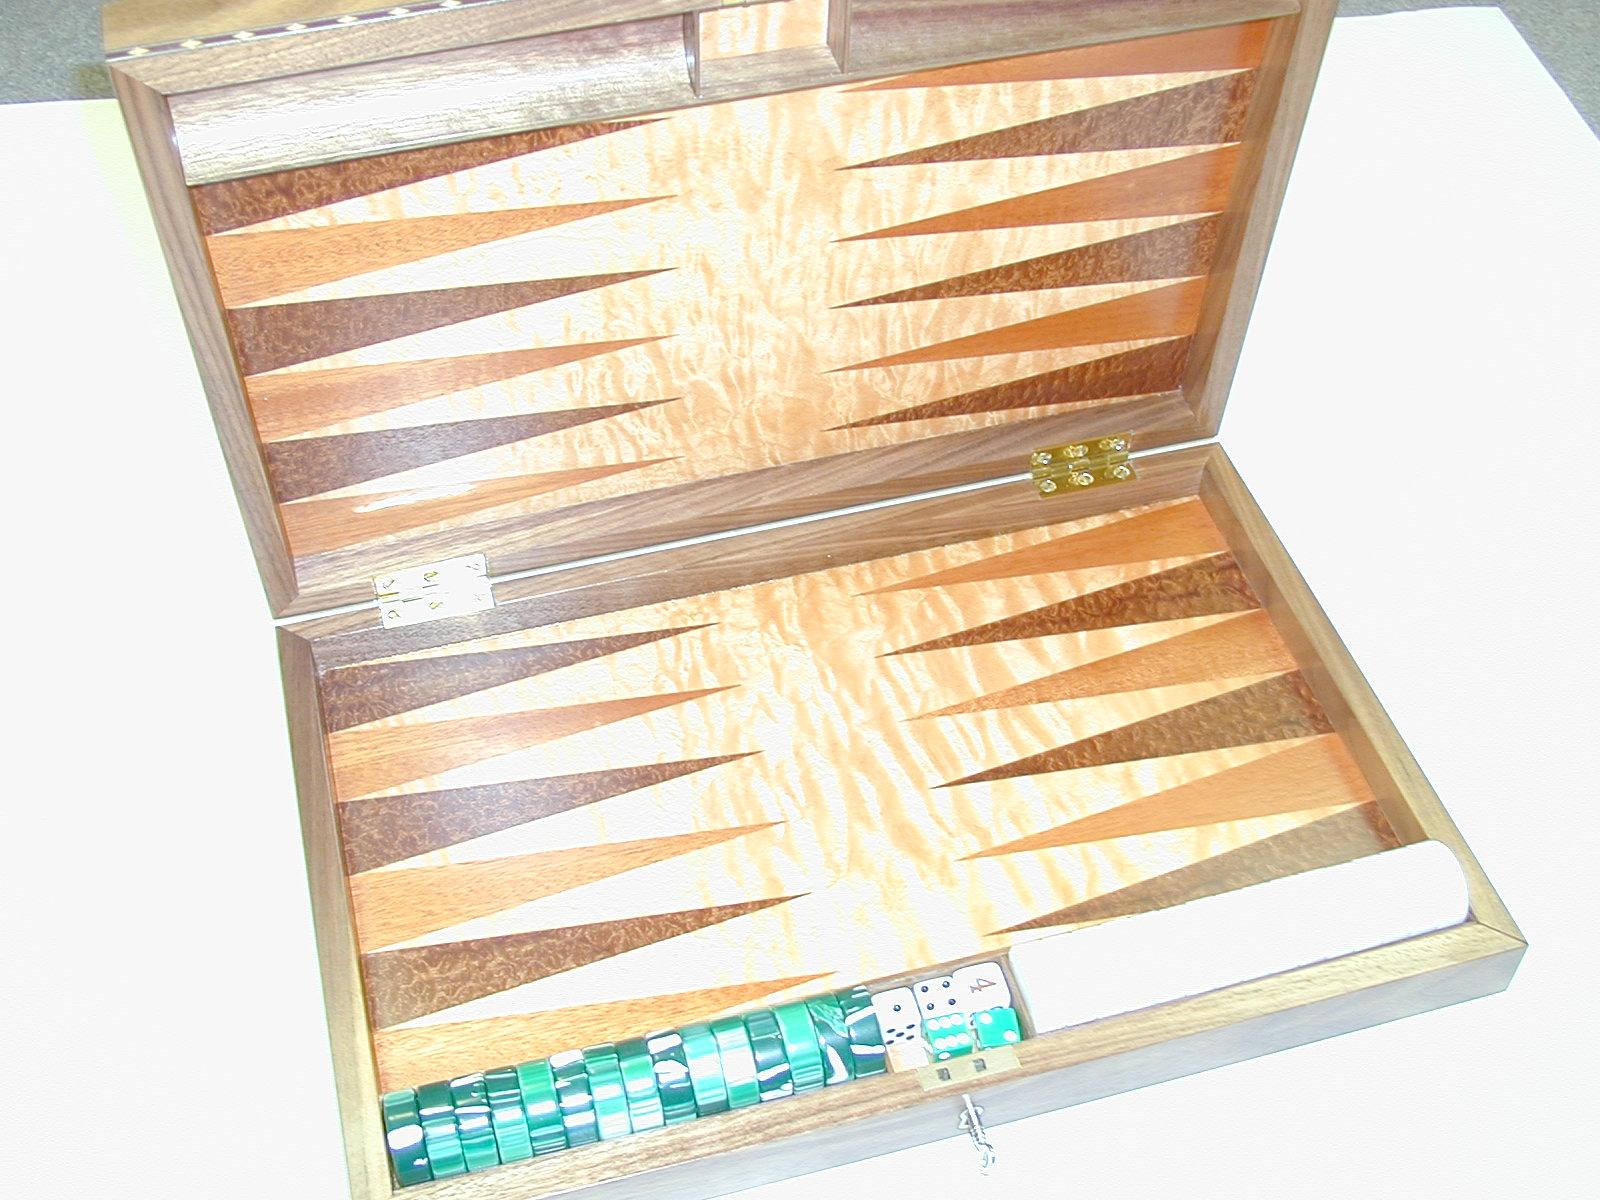 backgammon (26).JPG